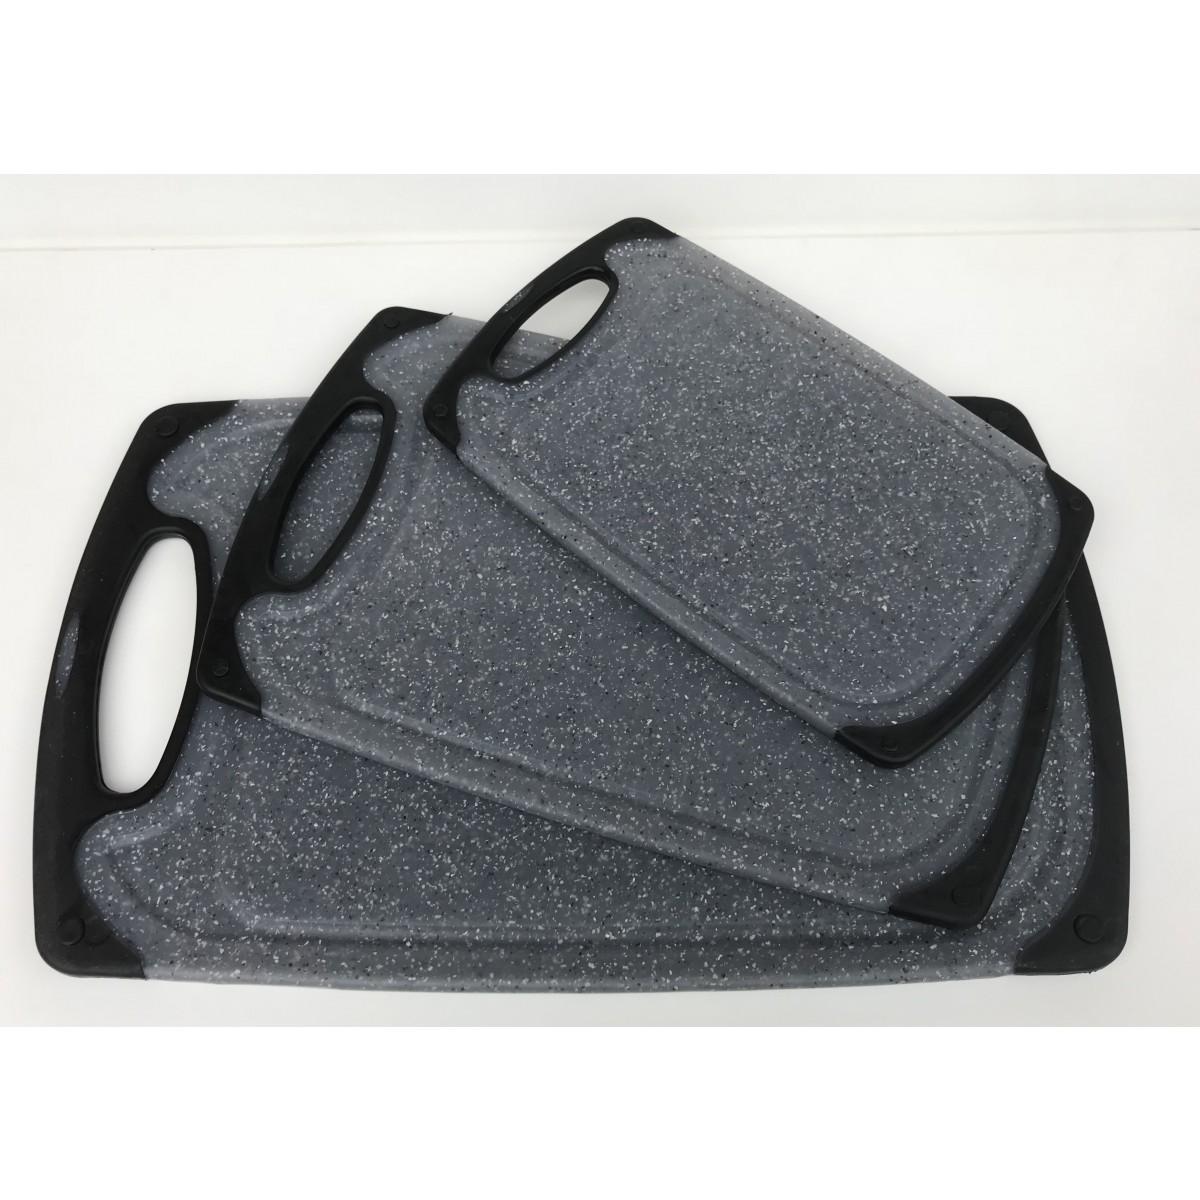 CONZEPT Skærebræt grå plast 25 x 15 x 0,9 cm.